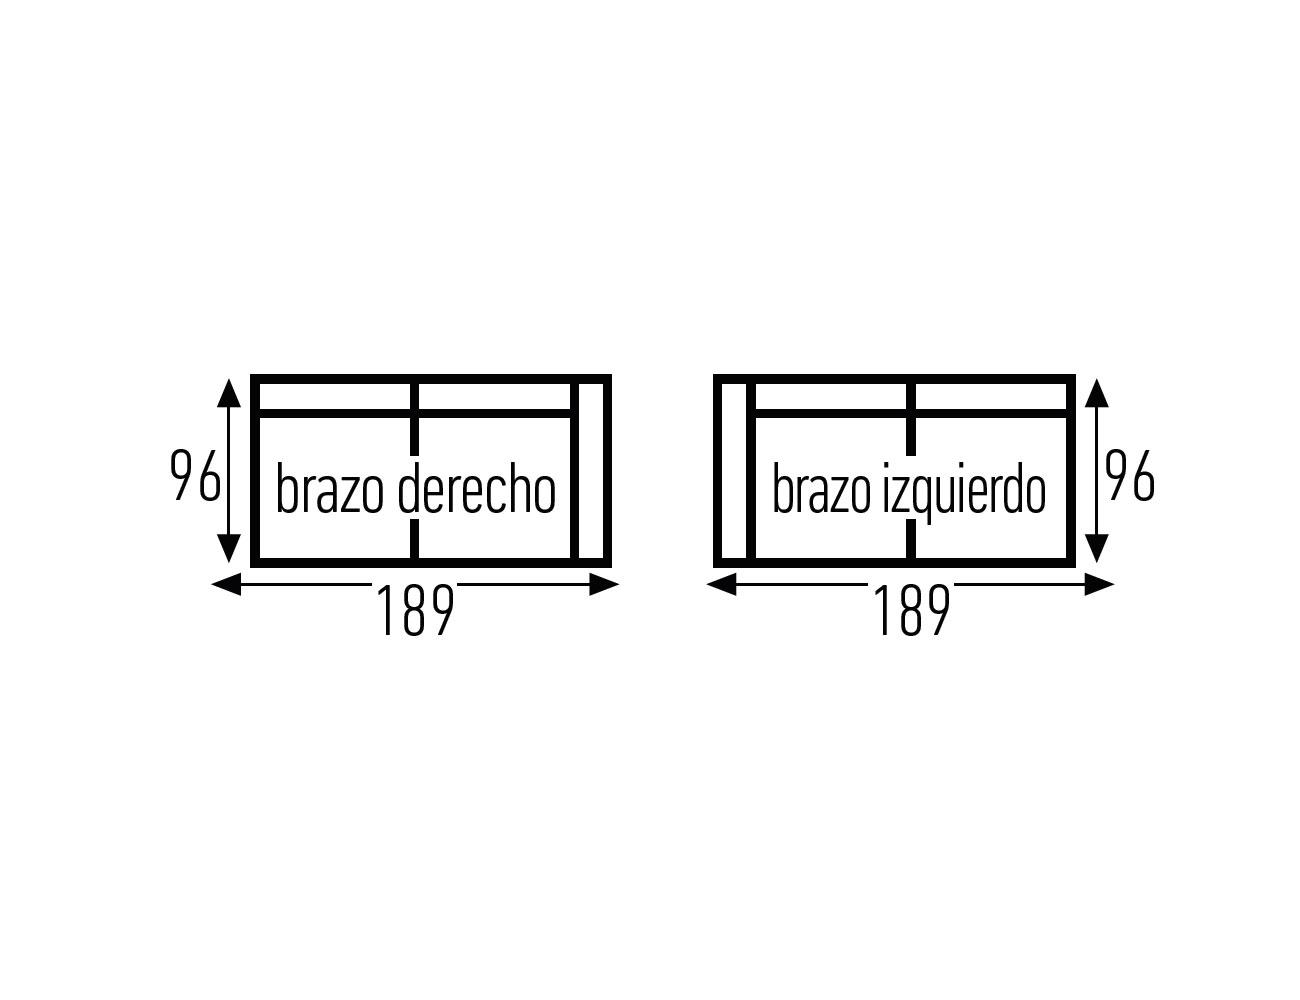 Croquis 3p sin 1 brazo 18911